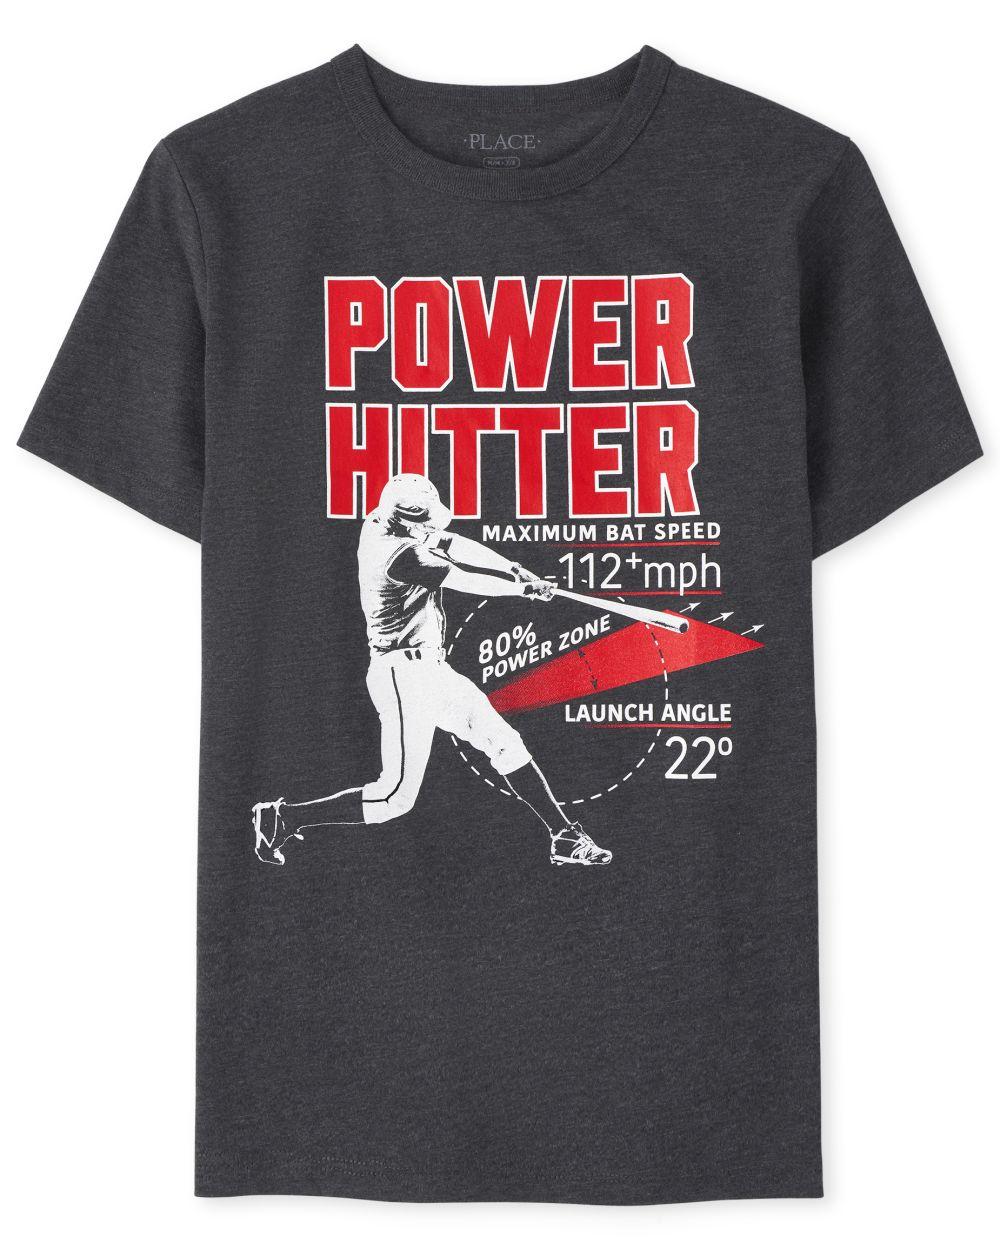 Boys Baseball Graphic Tee - Black T-Shirt